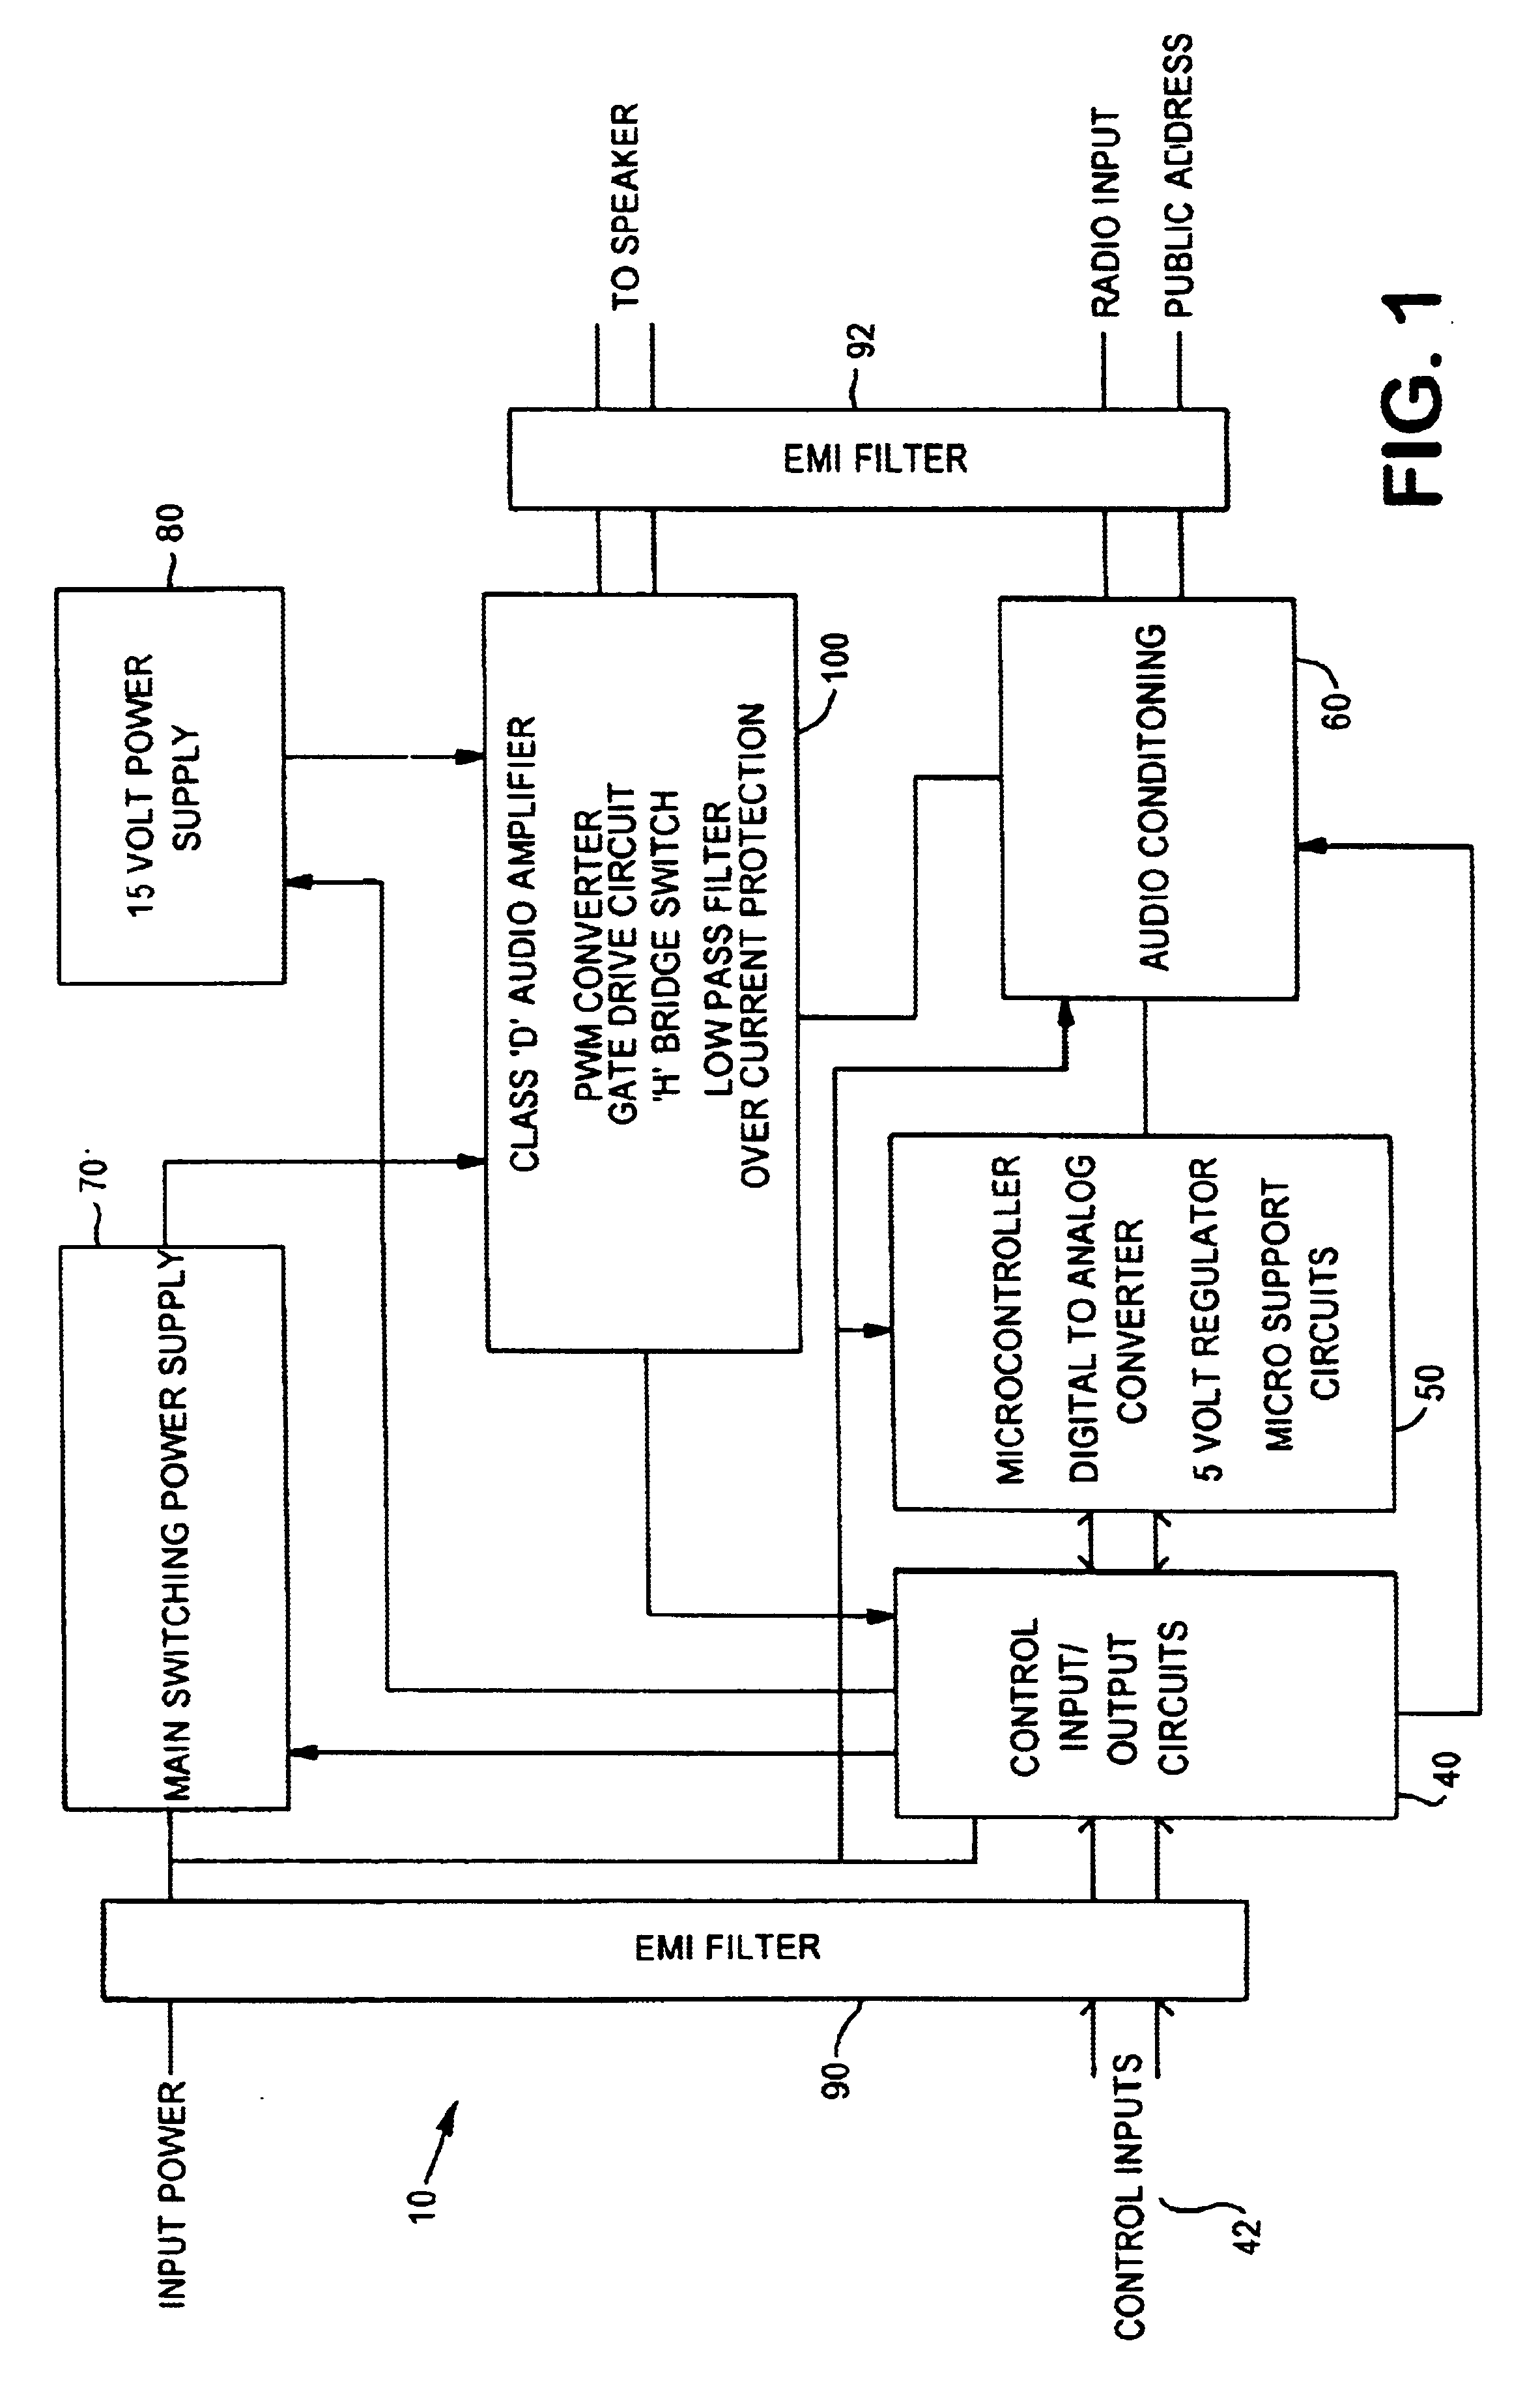 911ep Td39rab Wiring Diagram